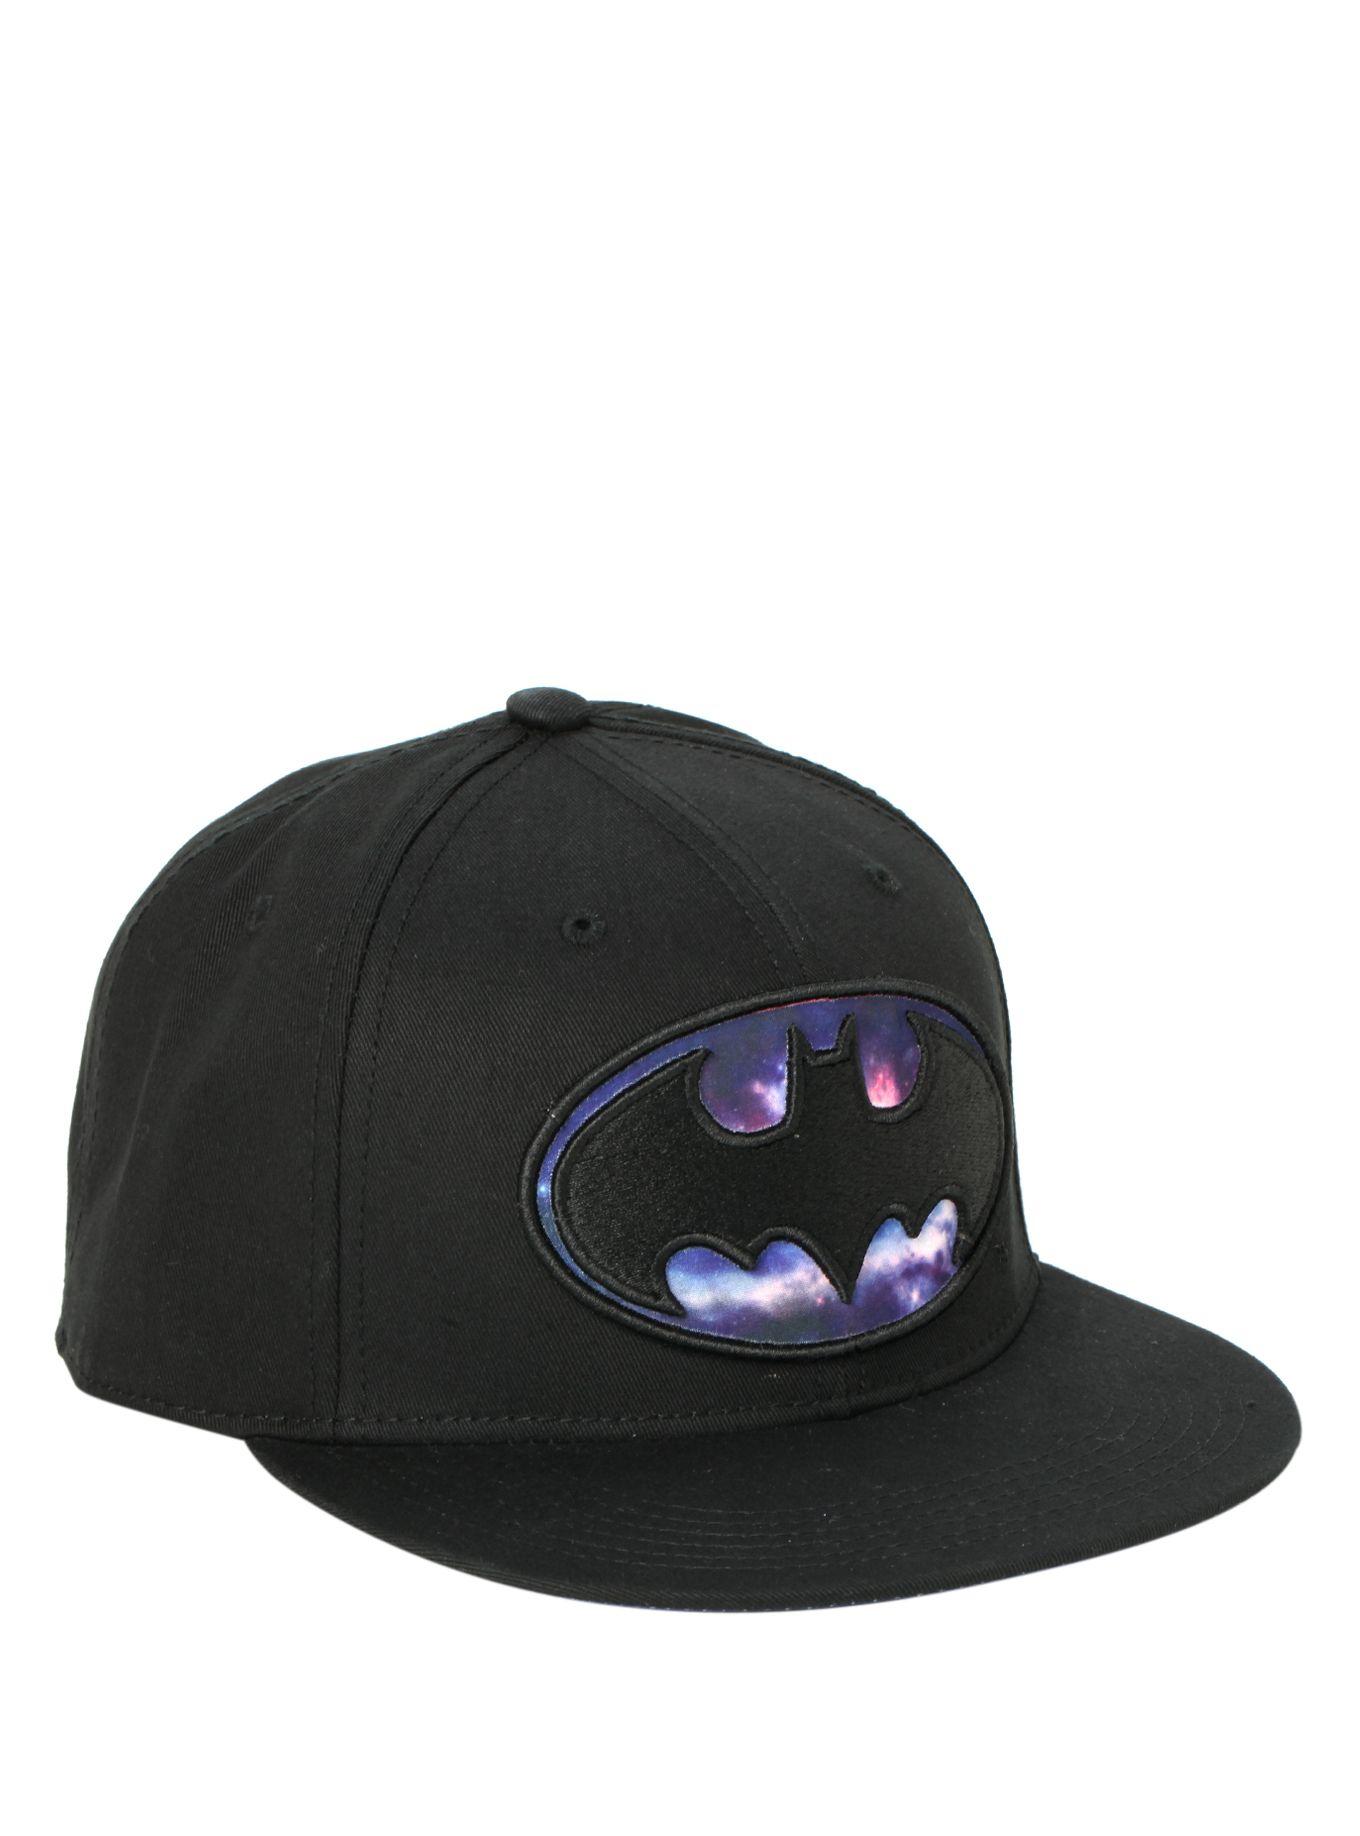 b43faabe67ff DC Comics Batman Galaxy Logo Snapback Hat | Hot Topic. My third choice